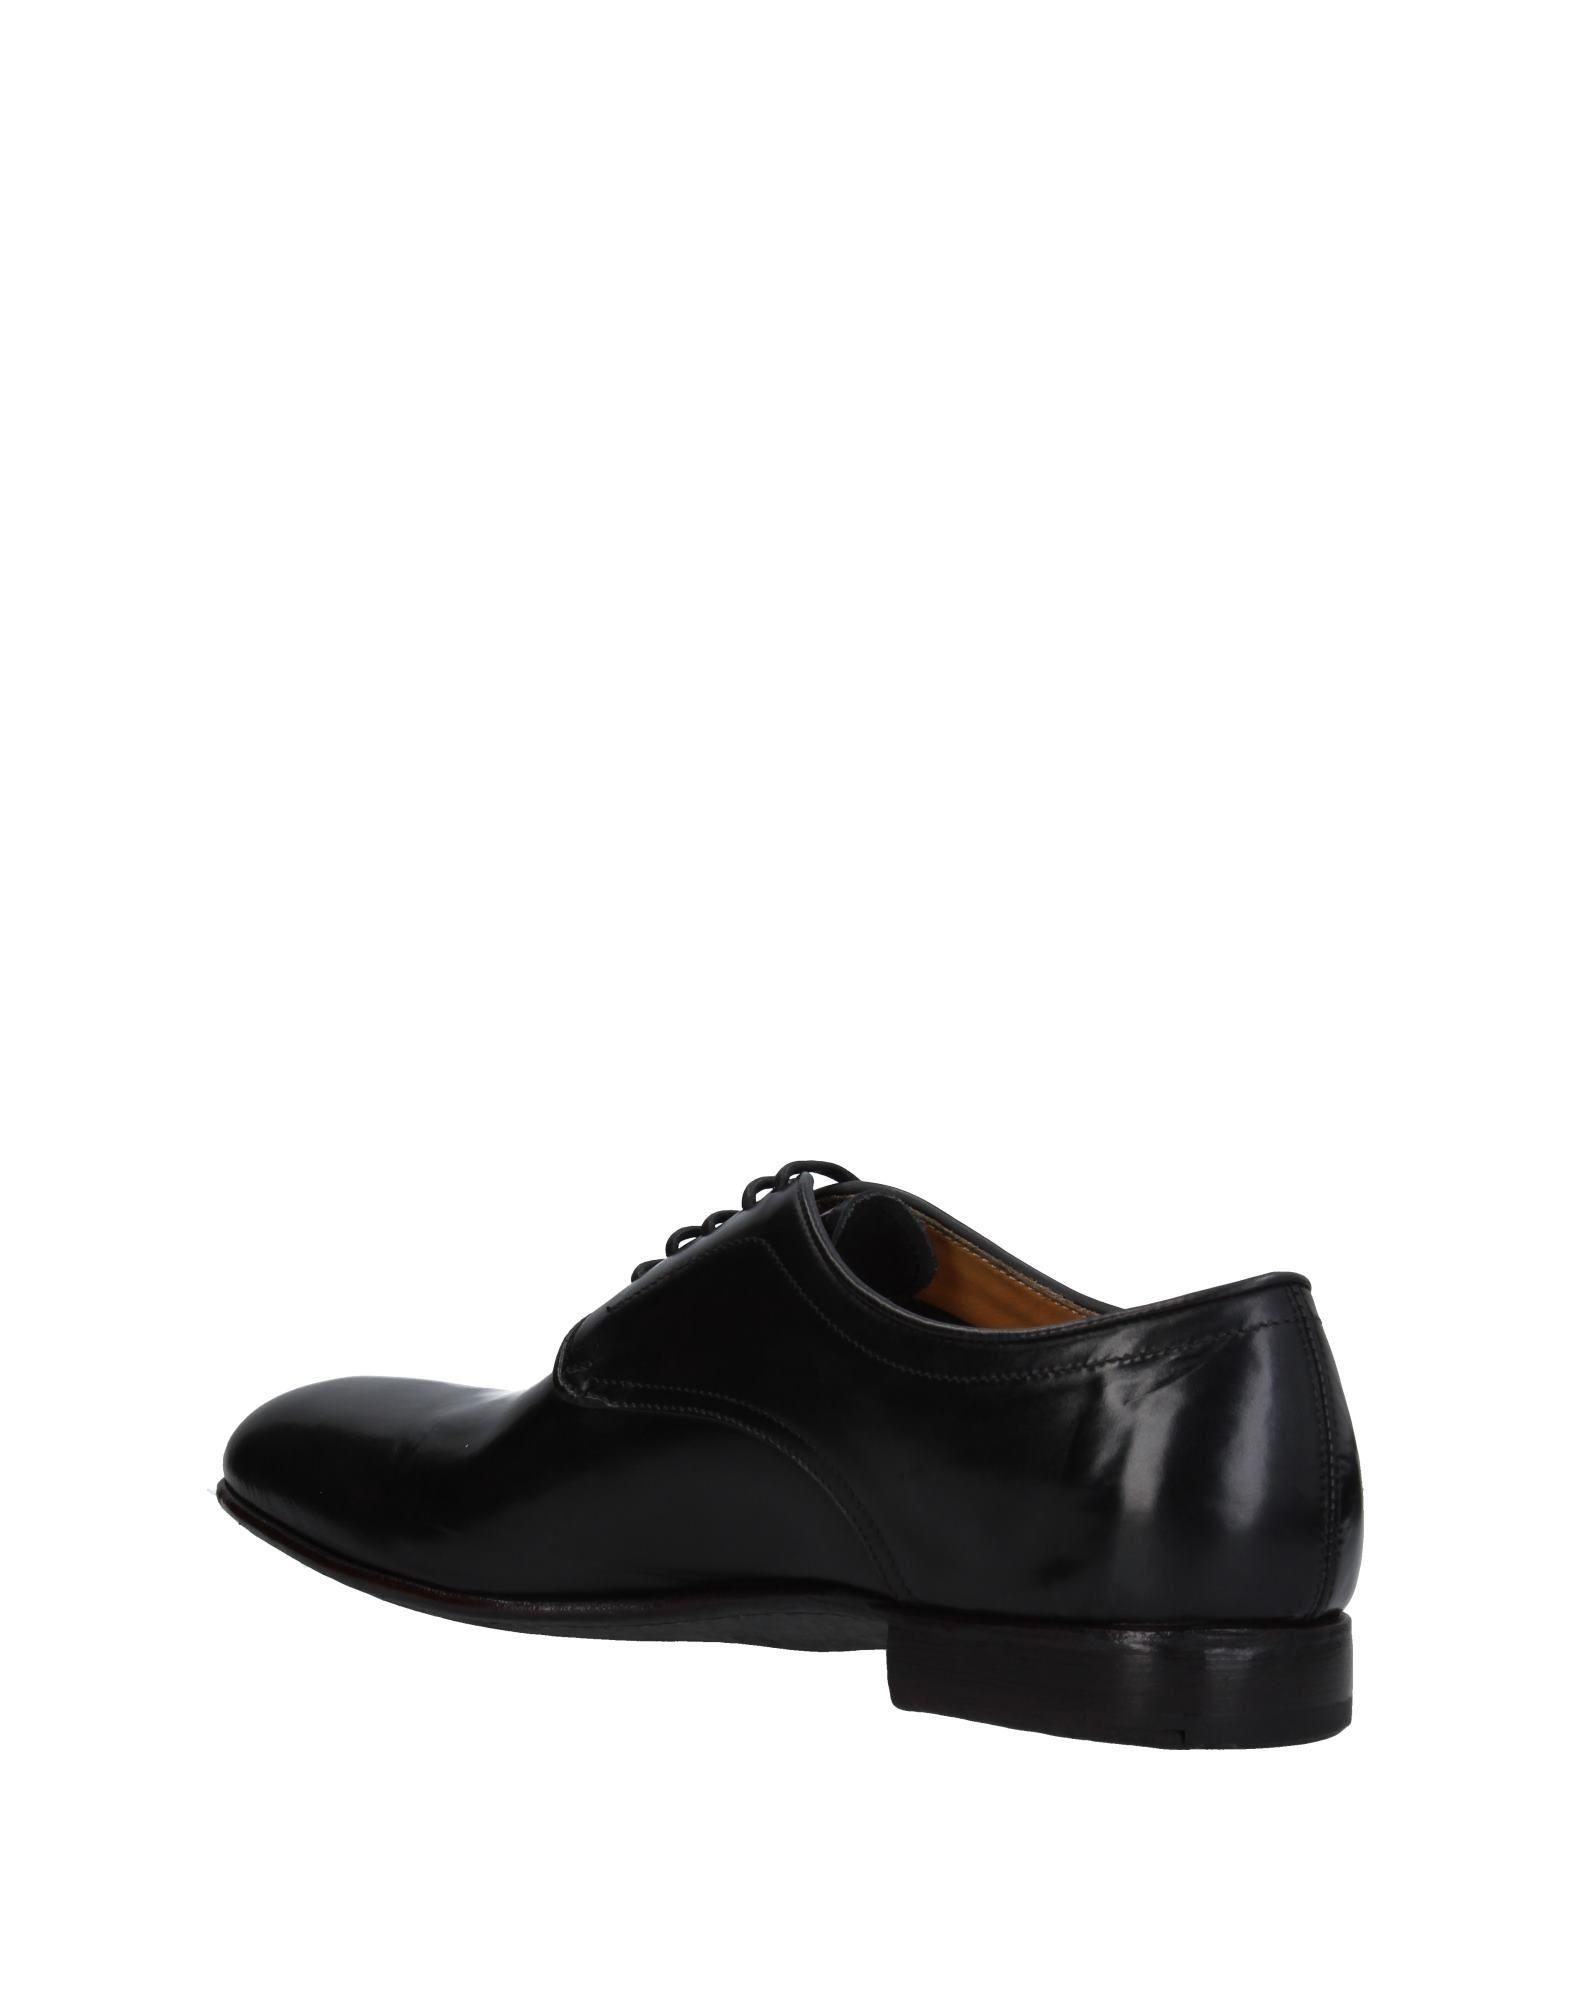 ... Chaussures À Lacets Alberto Fasciani Homme - Chaussures À Lacets  Alberto Fasciani sur ...